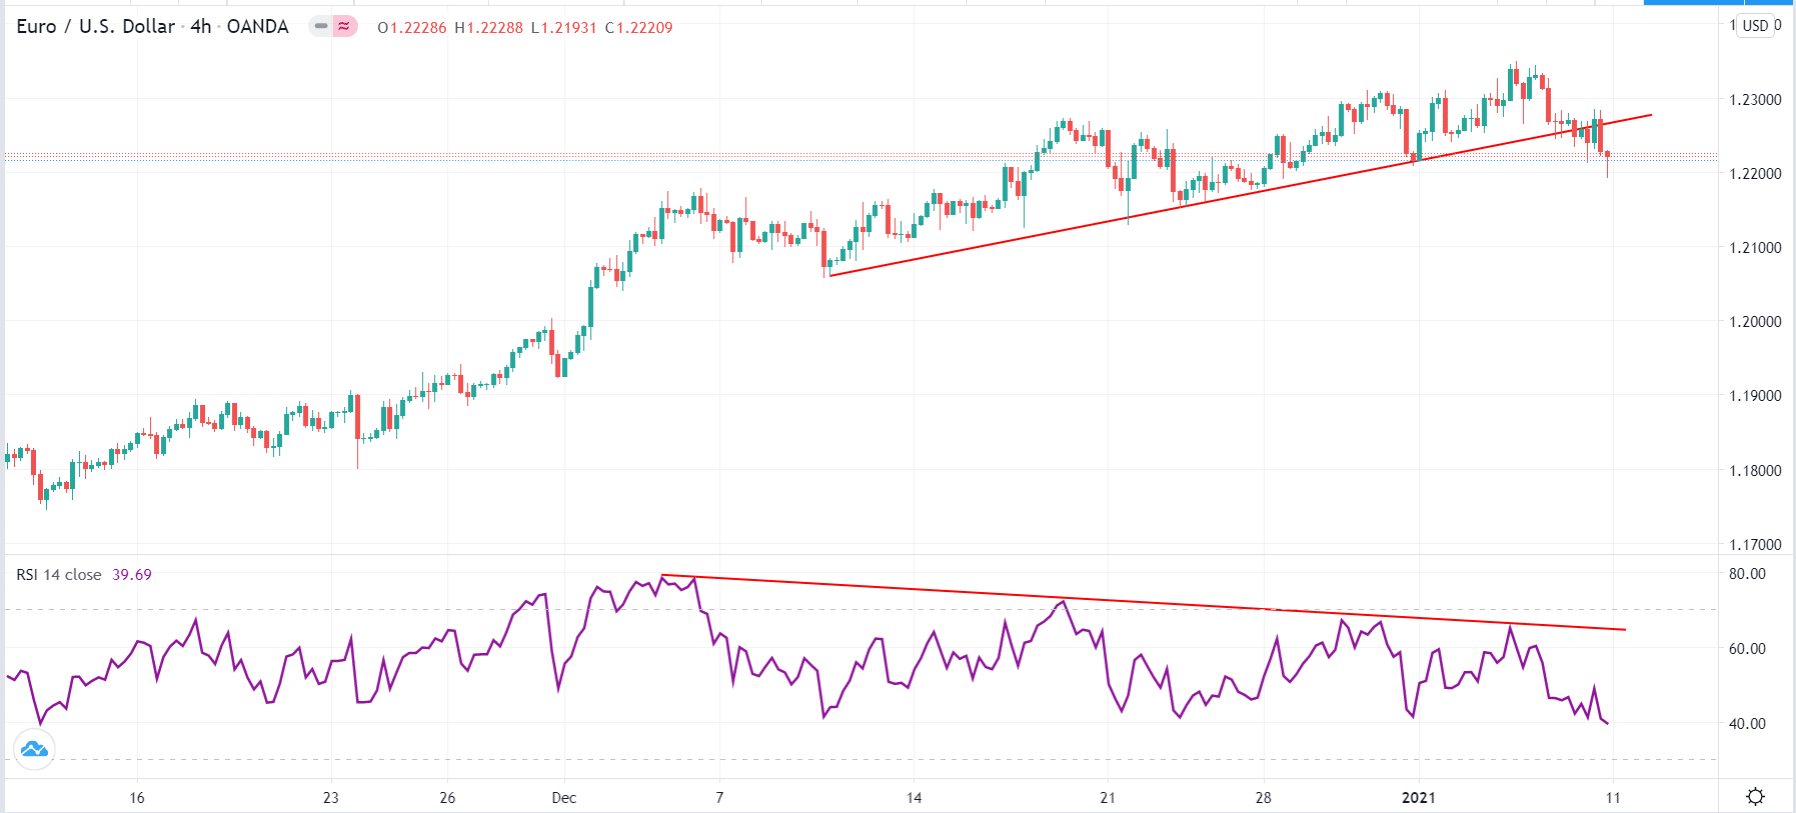 EUR/USD divergence